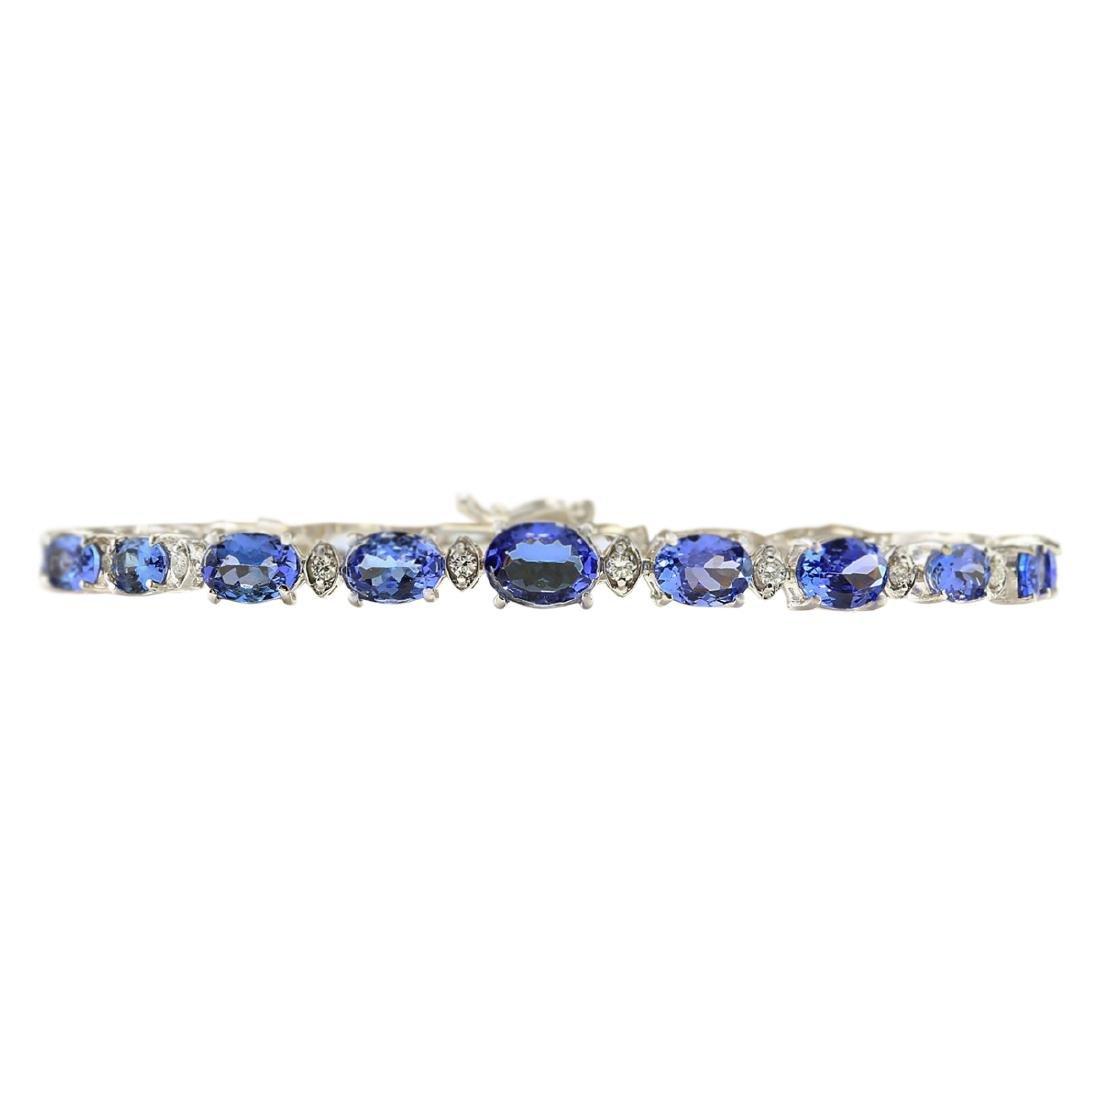 11.80 CTW Natural Tanzanite And Diamond Bracelet In 18K